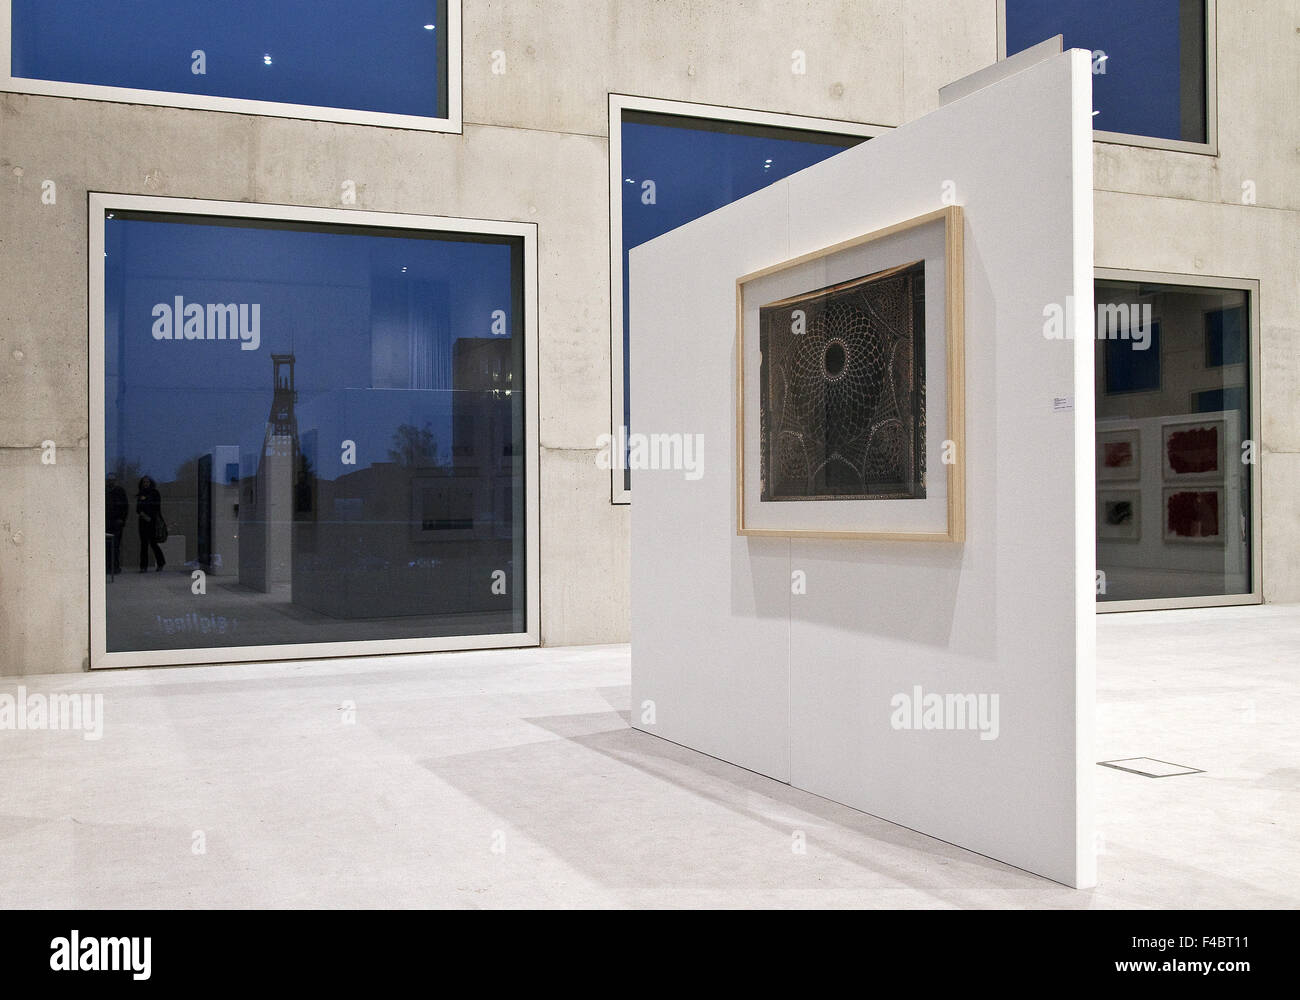 Exhibition, Zollverein cube, Essen, Germany - Stock Image